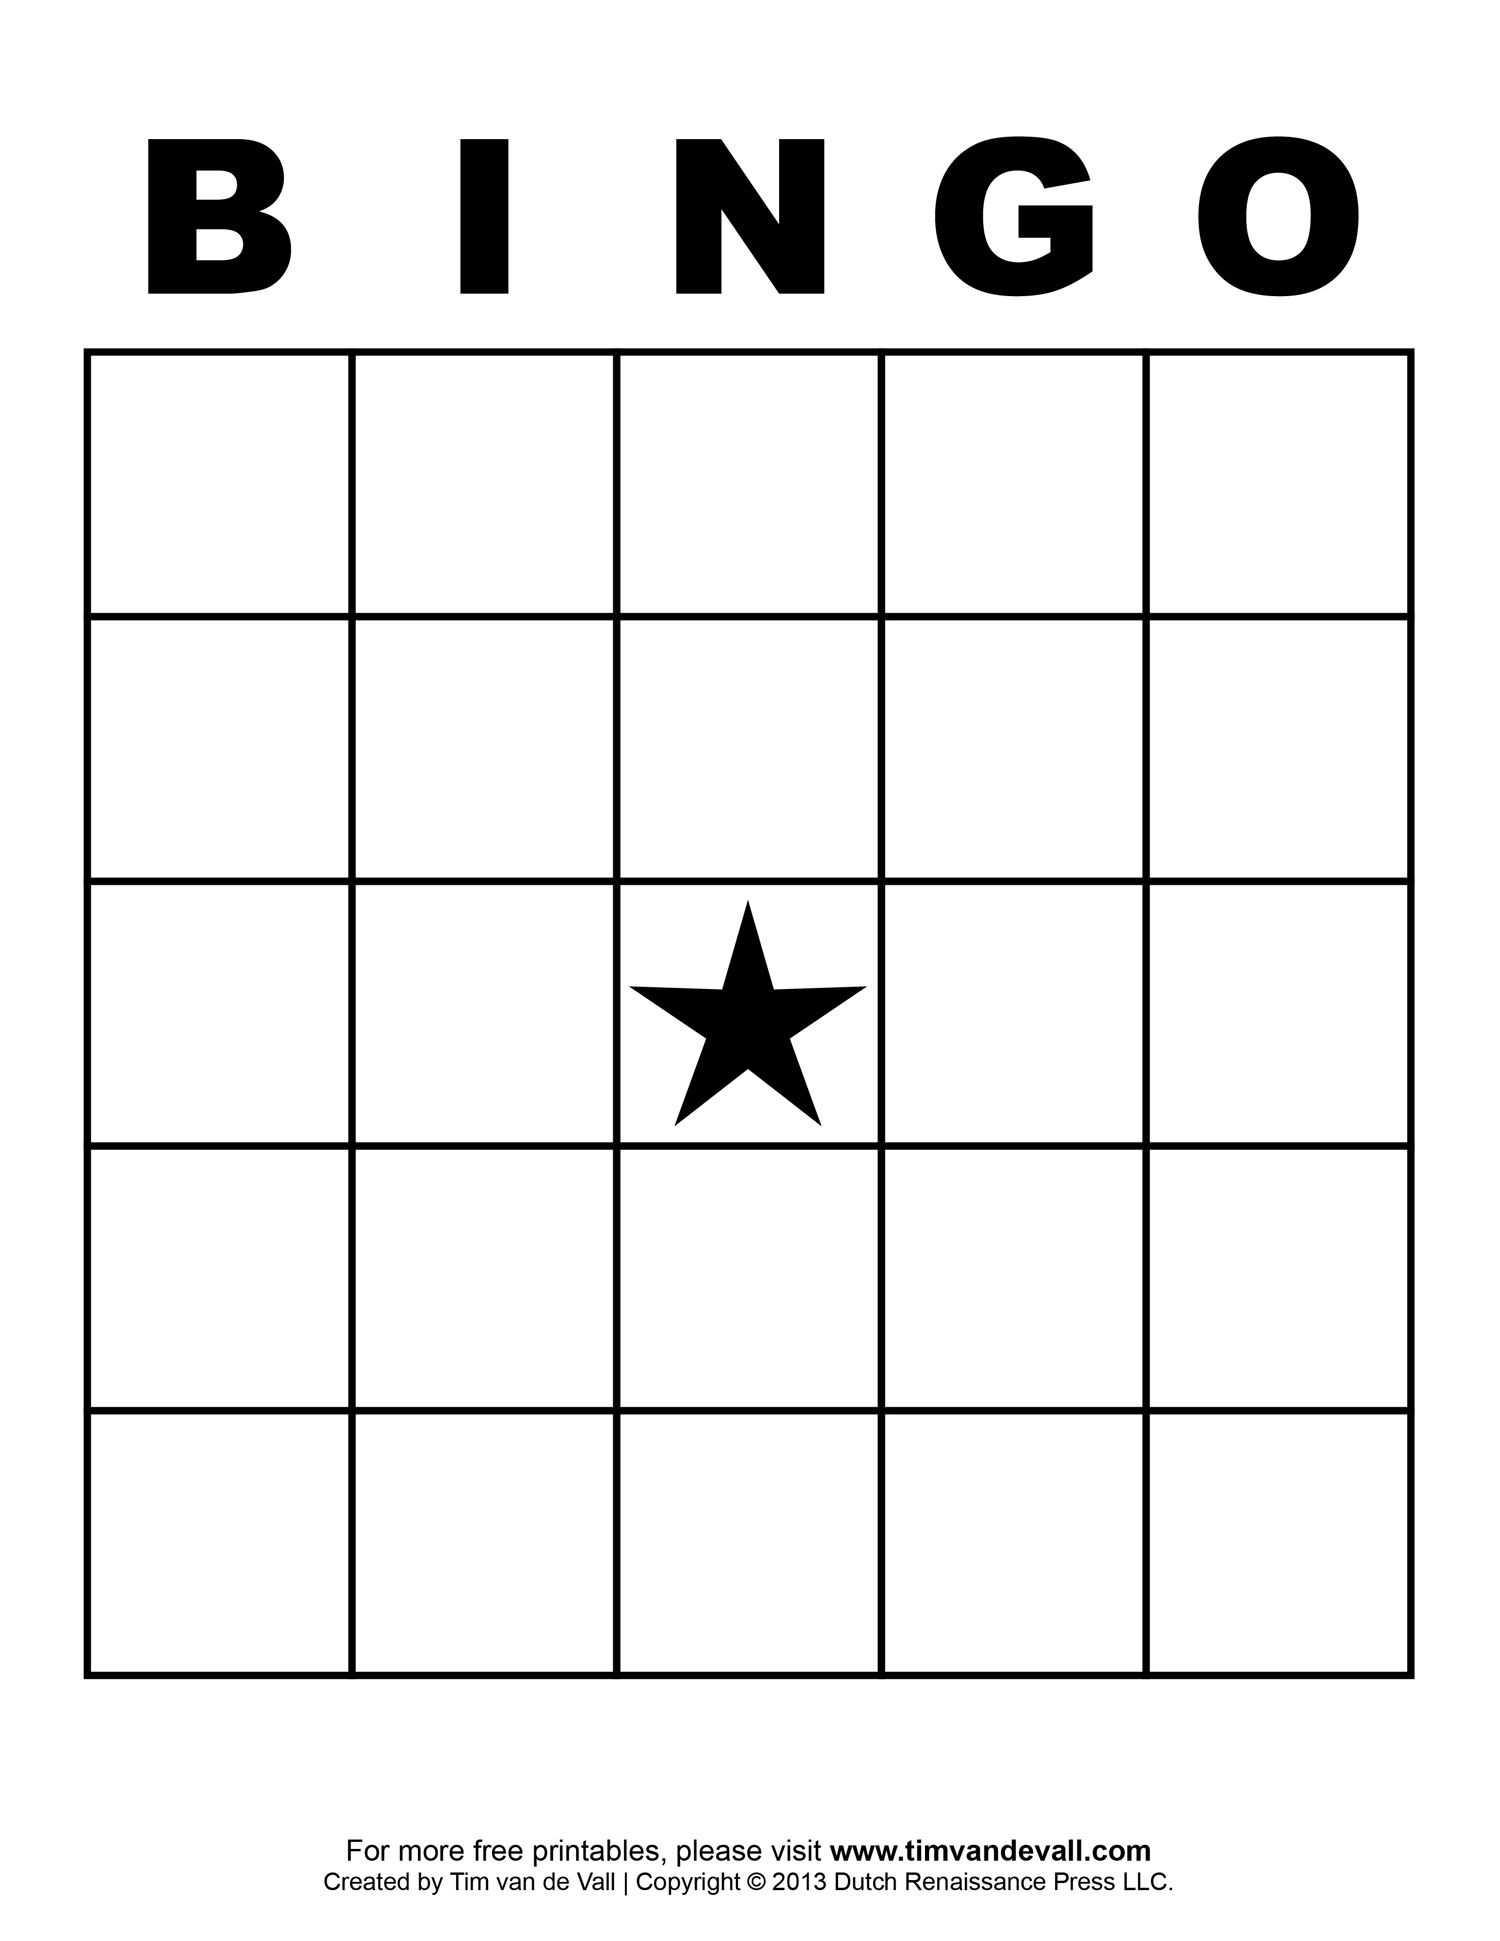 Free Printable Blank Bingo Cards Template 4 X 4 | Free Bingo With Regard To Blank Bingo Template Pdf